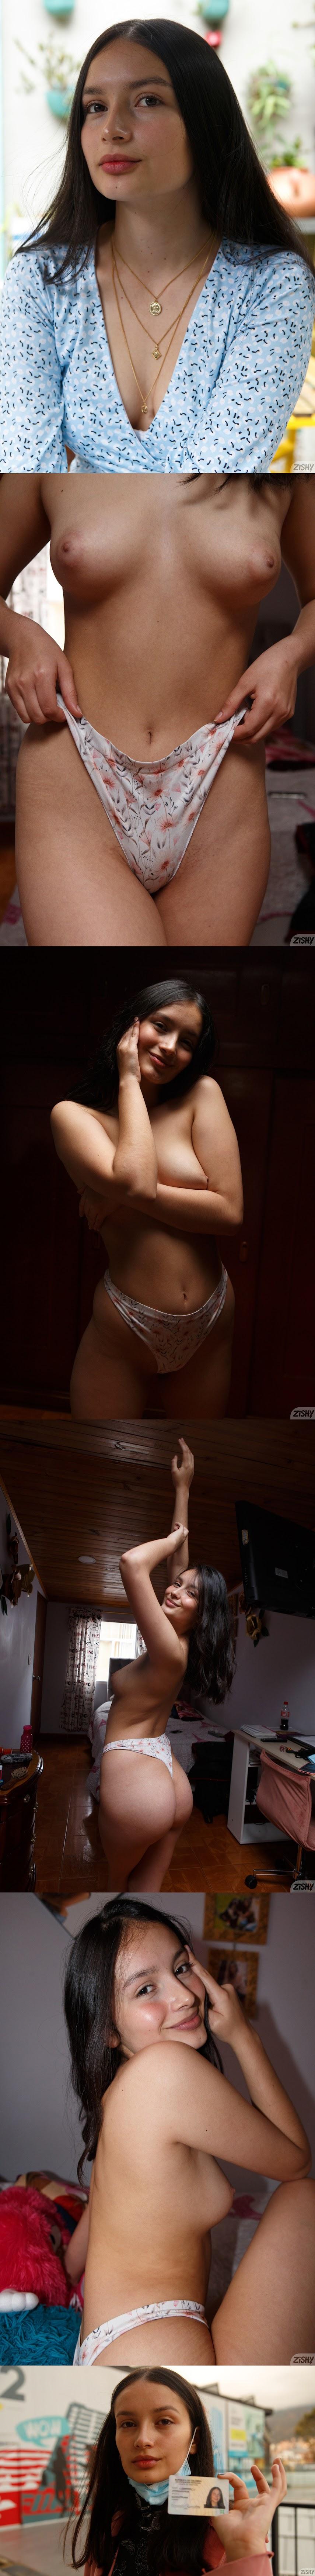 1-[Zishy] Luisa Medrano - Ha Llegado